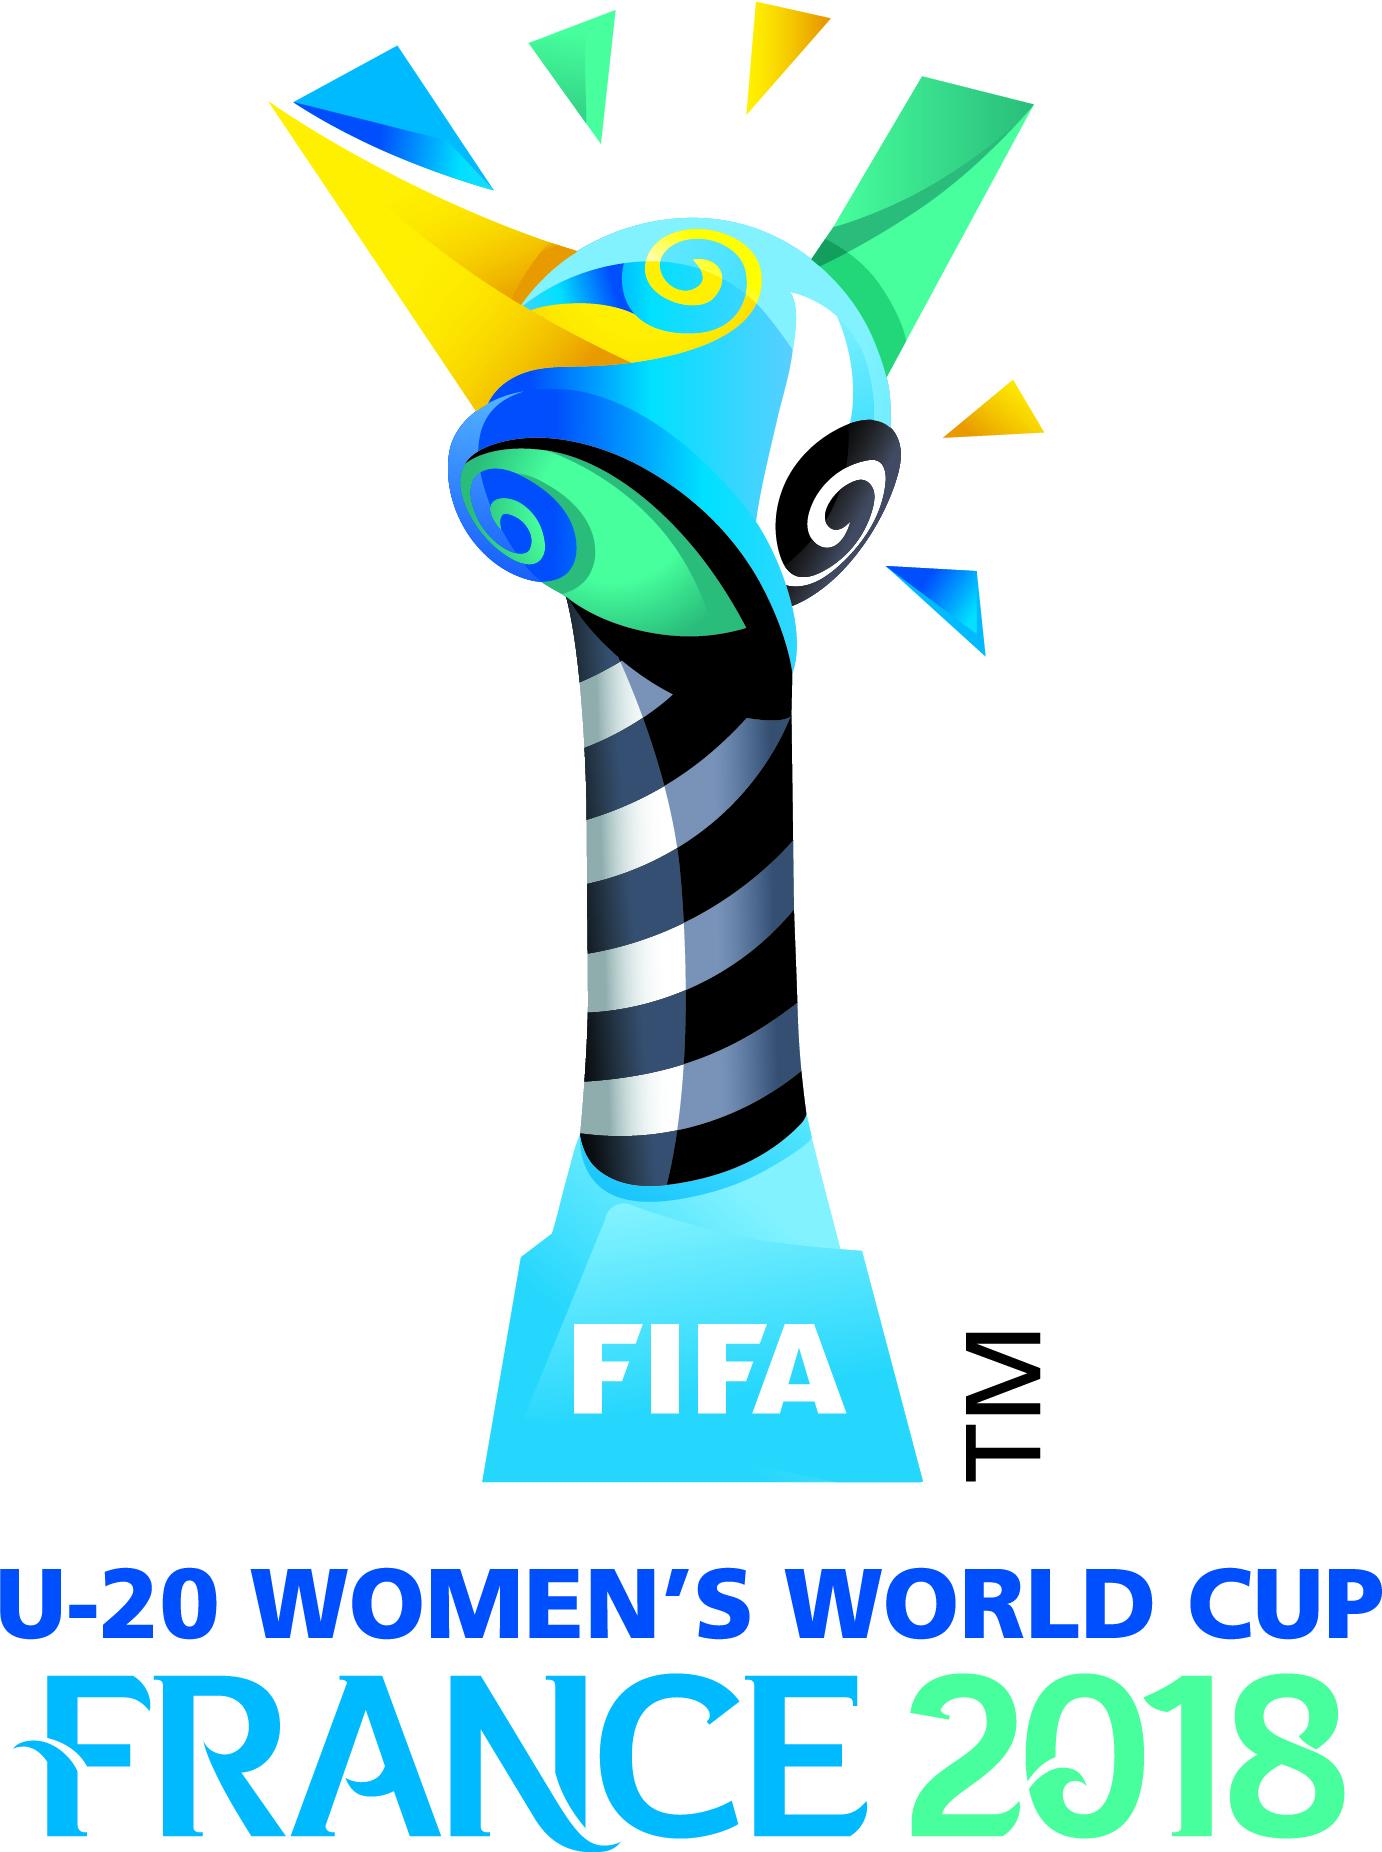 logo-officiel-Mondial-U20. Crédit. lesfeminines.fr